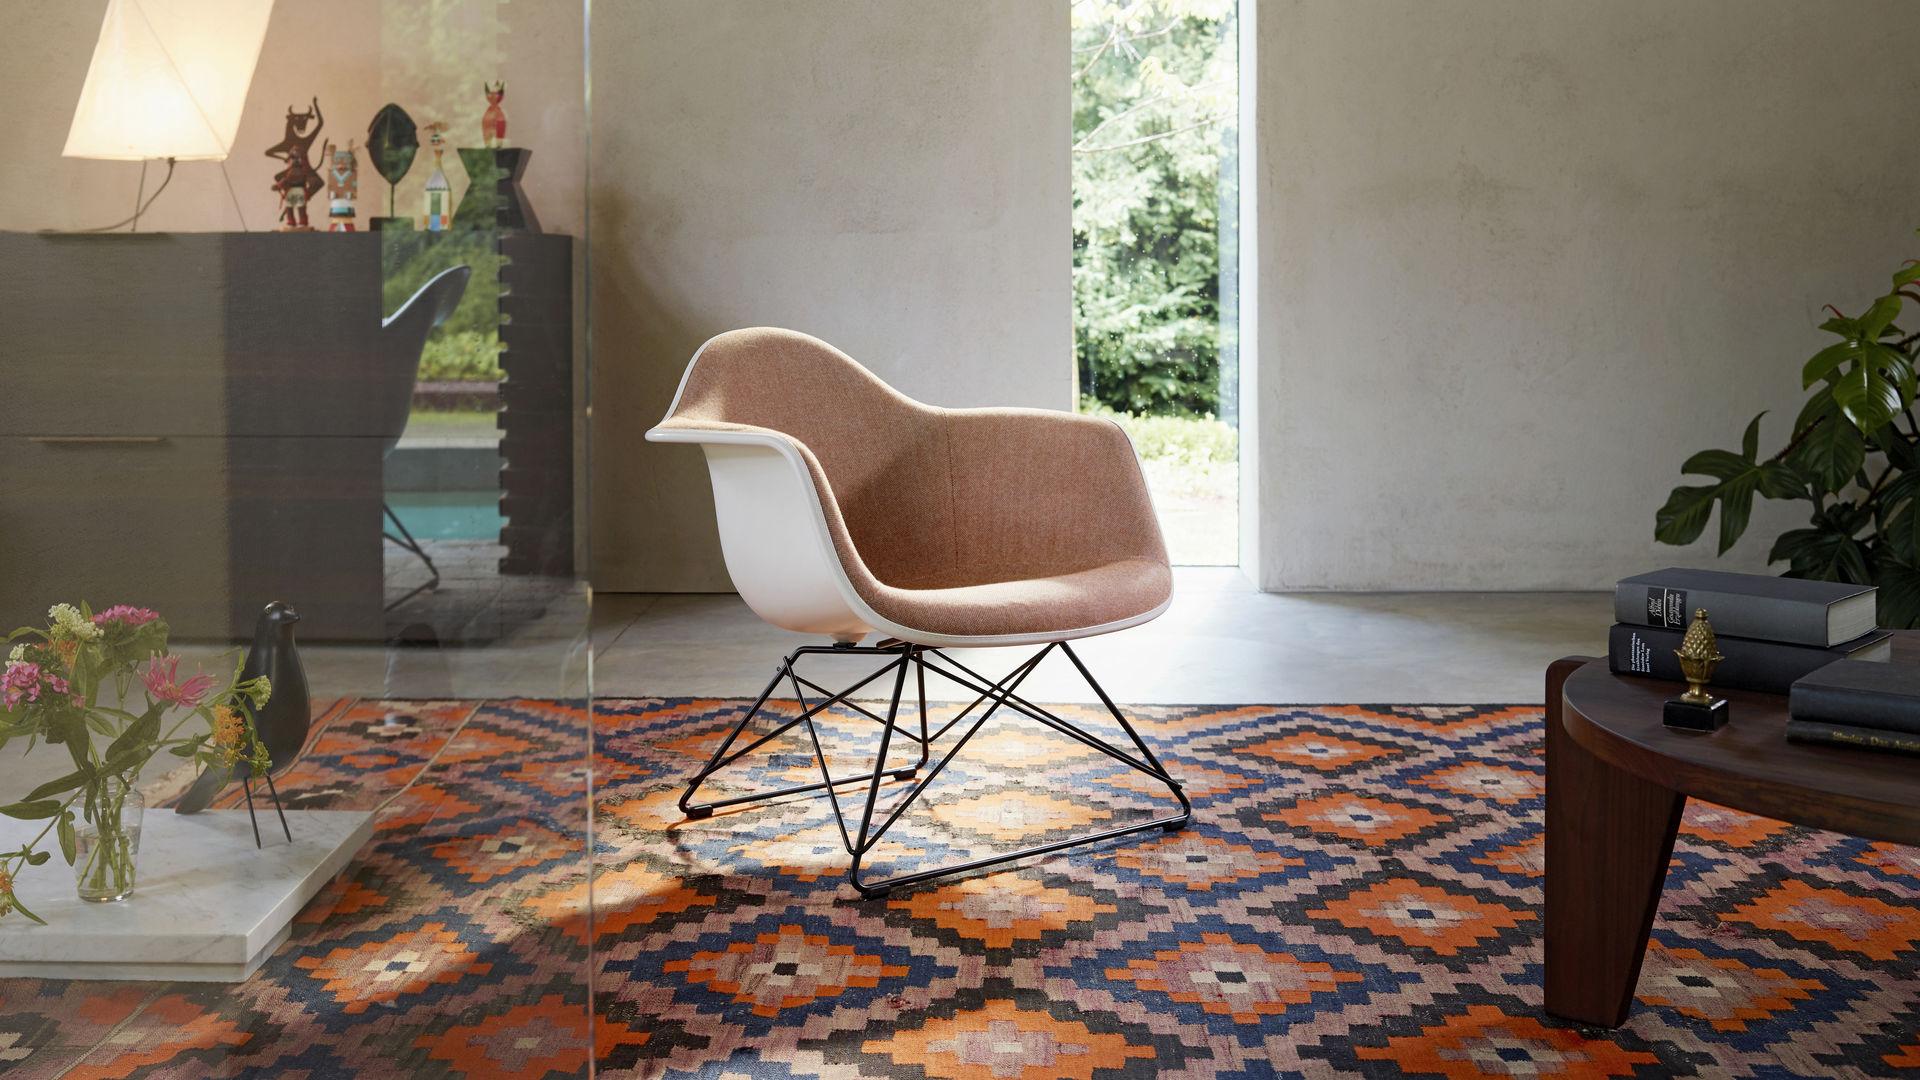 Eames Plastic Armchair Chair LAR Guéridon Bas Eames House Bird Wooden Dolls Akari_web_16-9